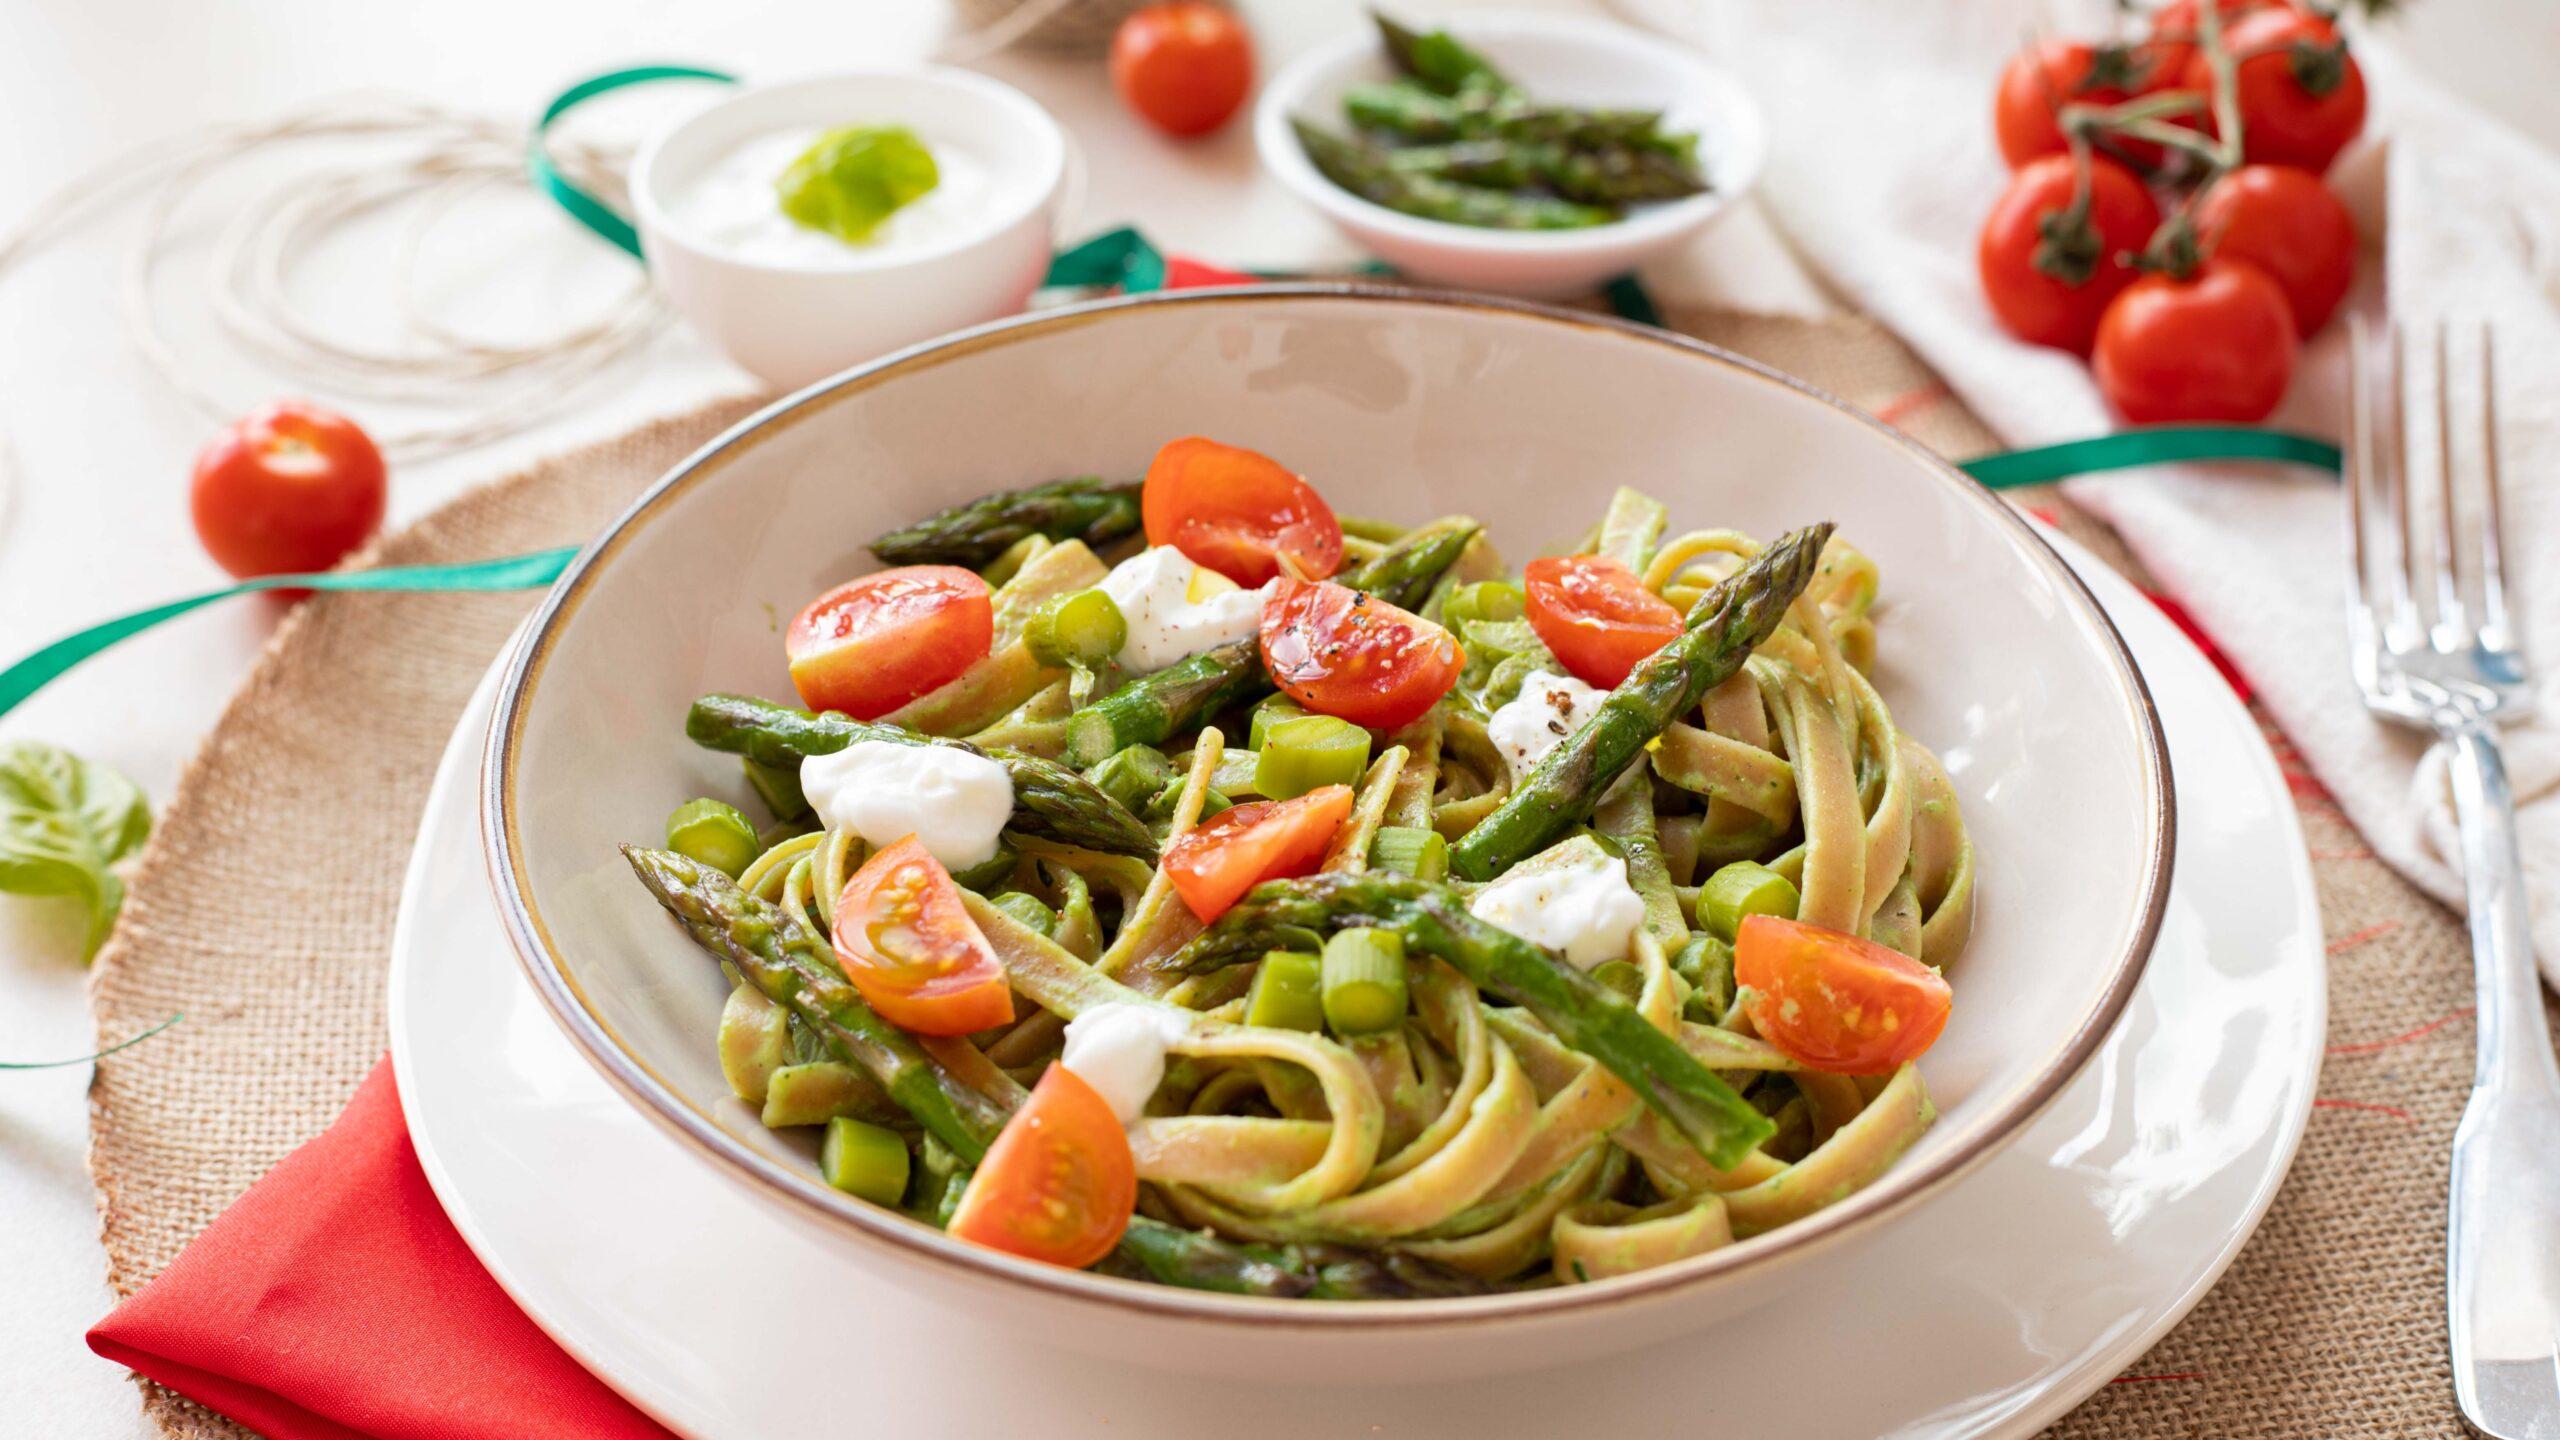 Linguine agli asparagi e crema di basilico